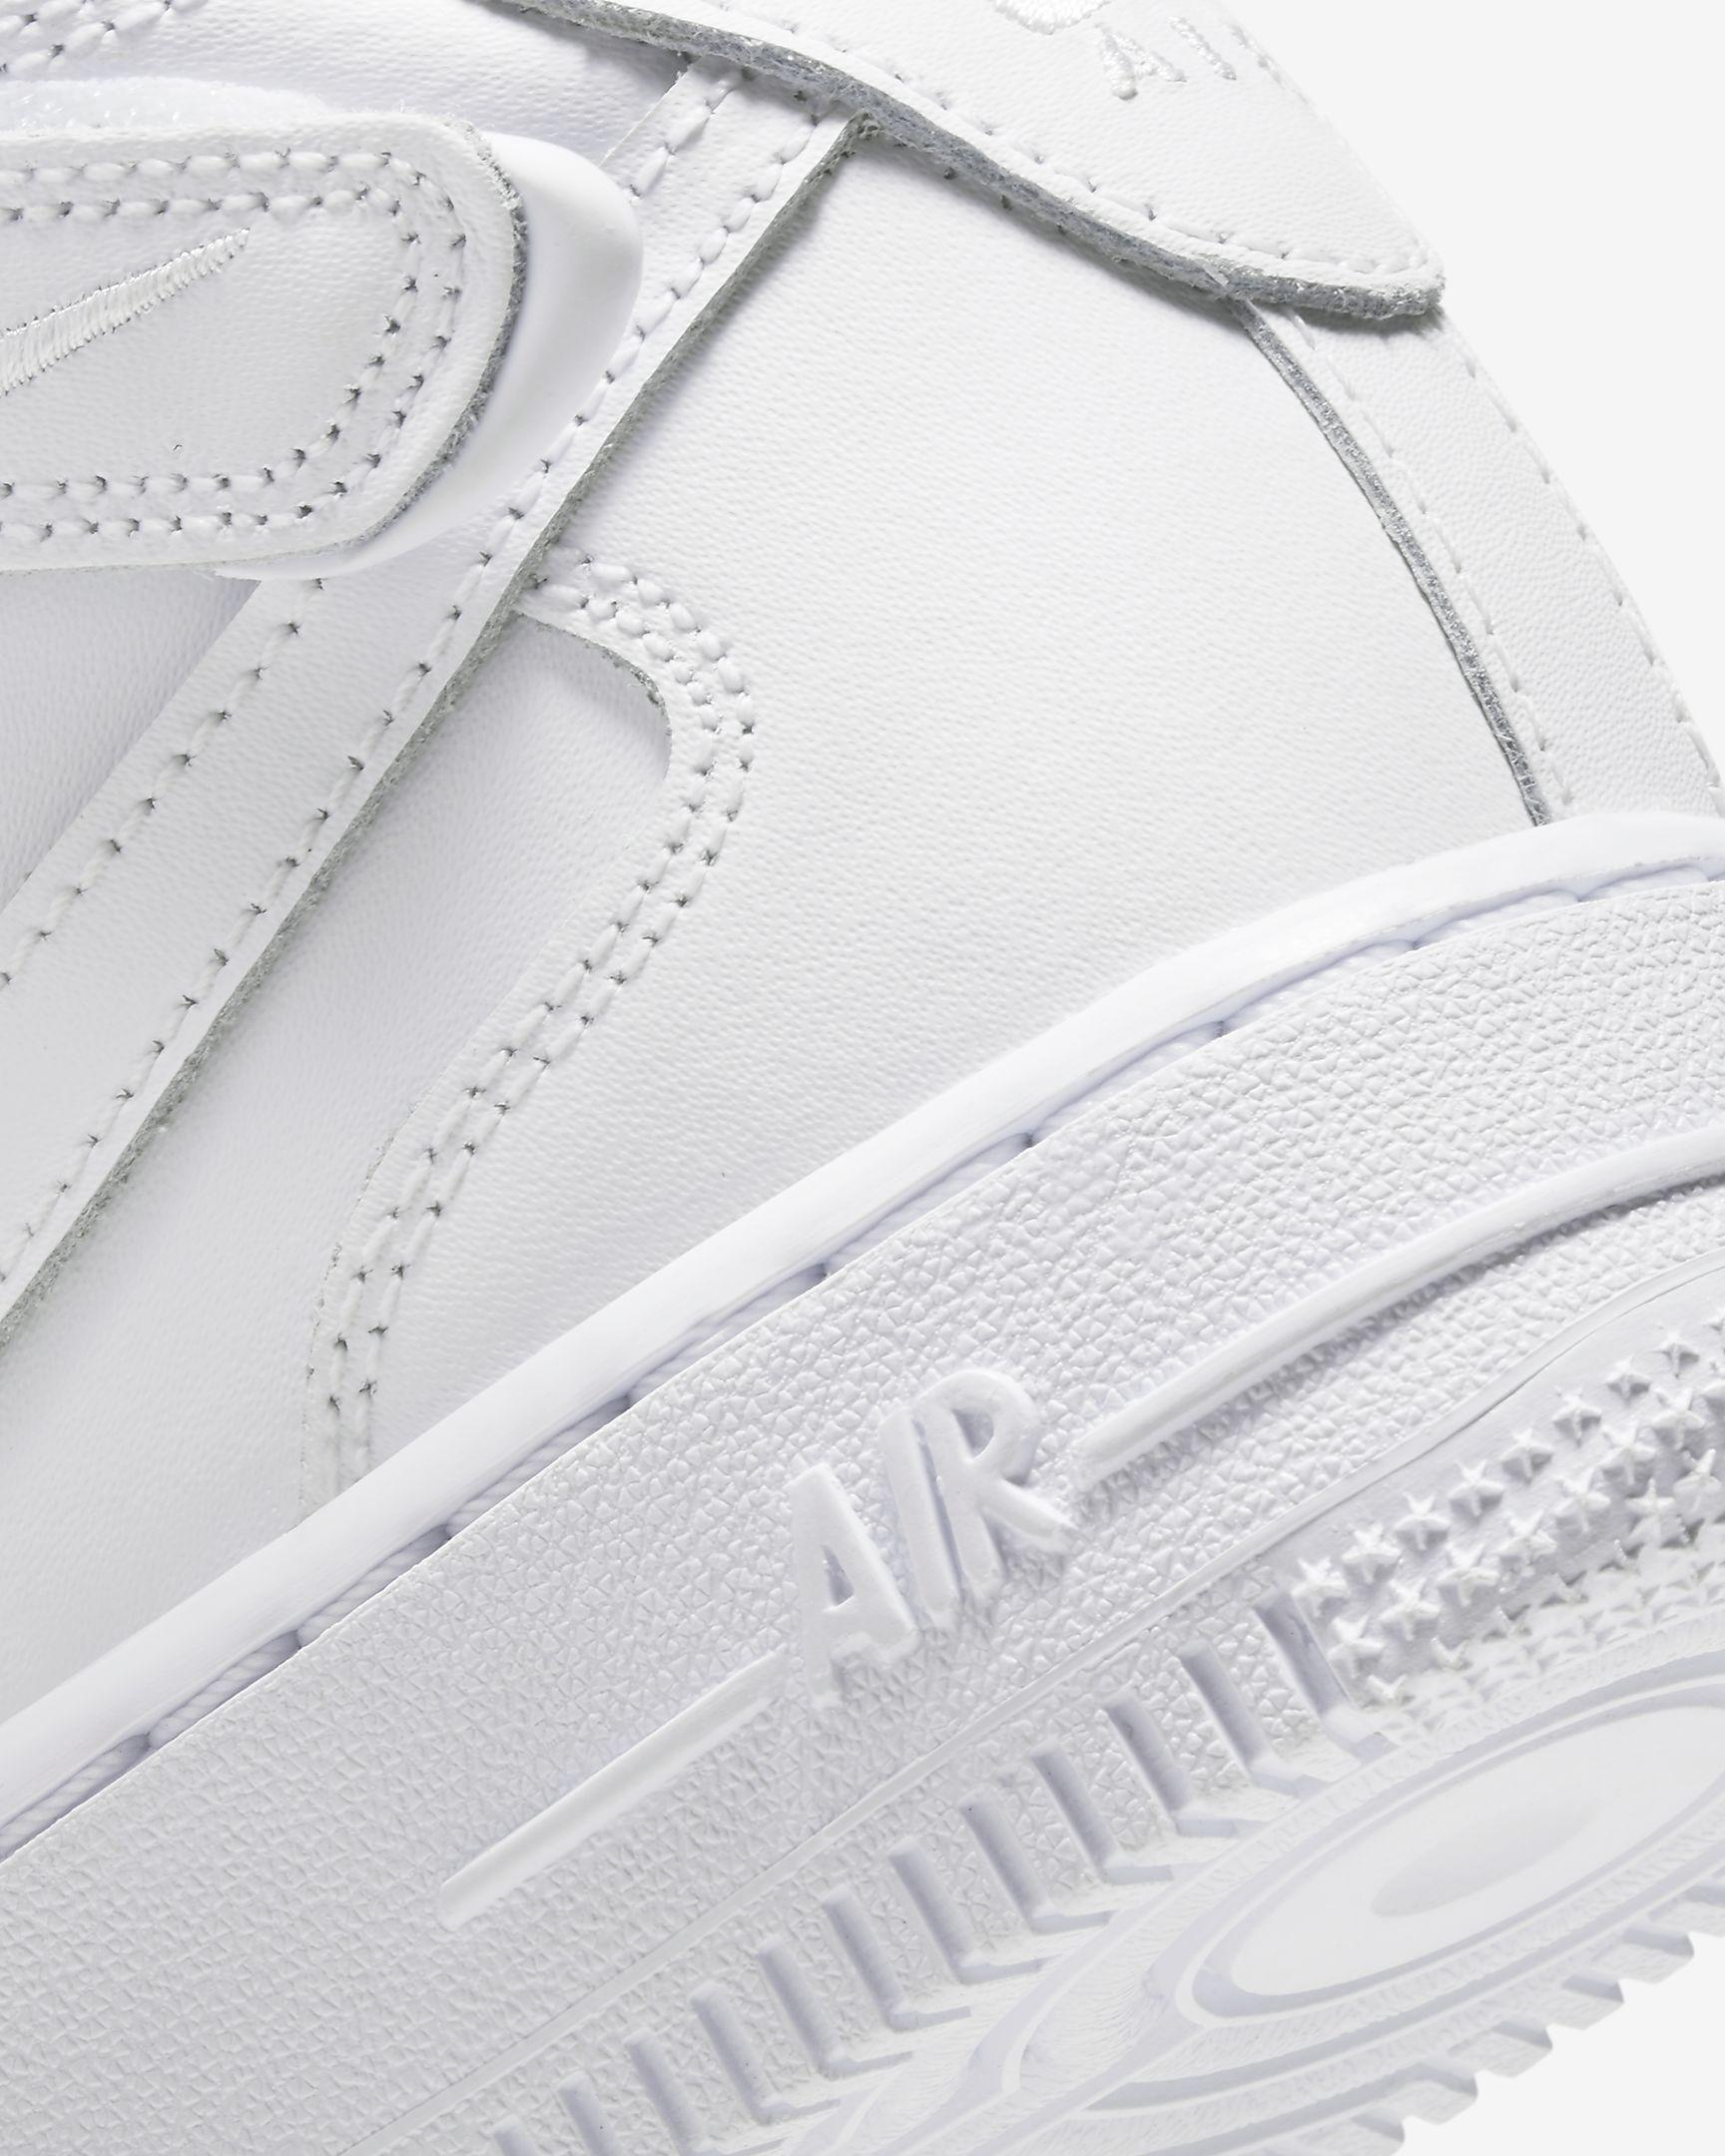 Tenisky Nike Air Force 1 Mid Biele-WWW.AIRFORCE.SK